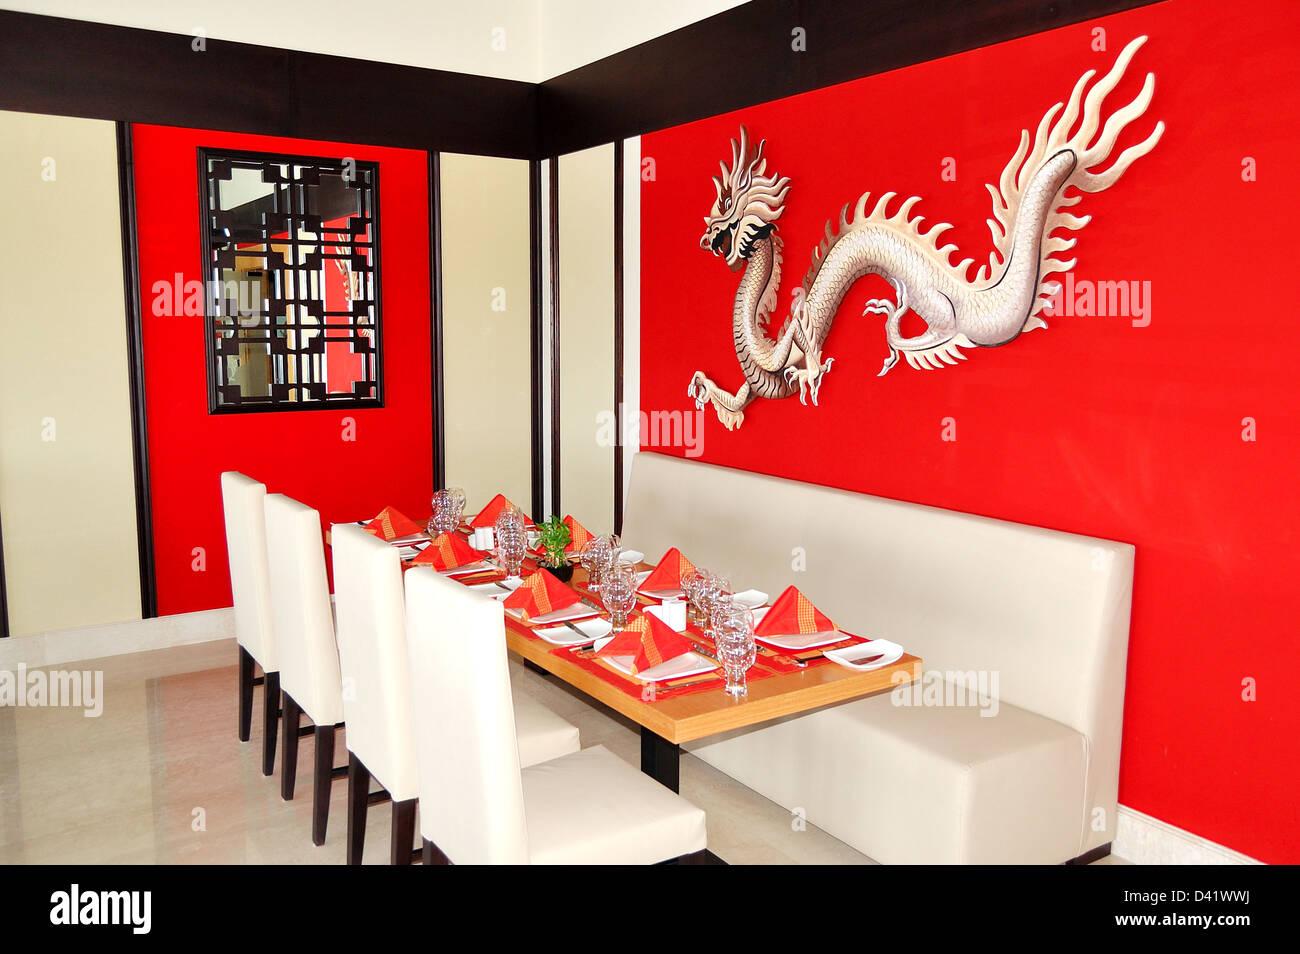 The Chinese Restaurant Interior Of Luxury Hotel Ras Al Khaimah Uae Stock Photo Alamy